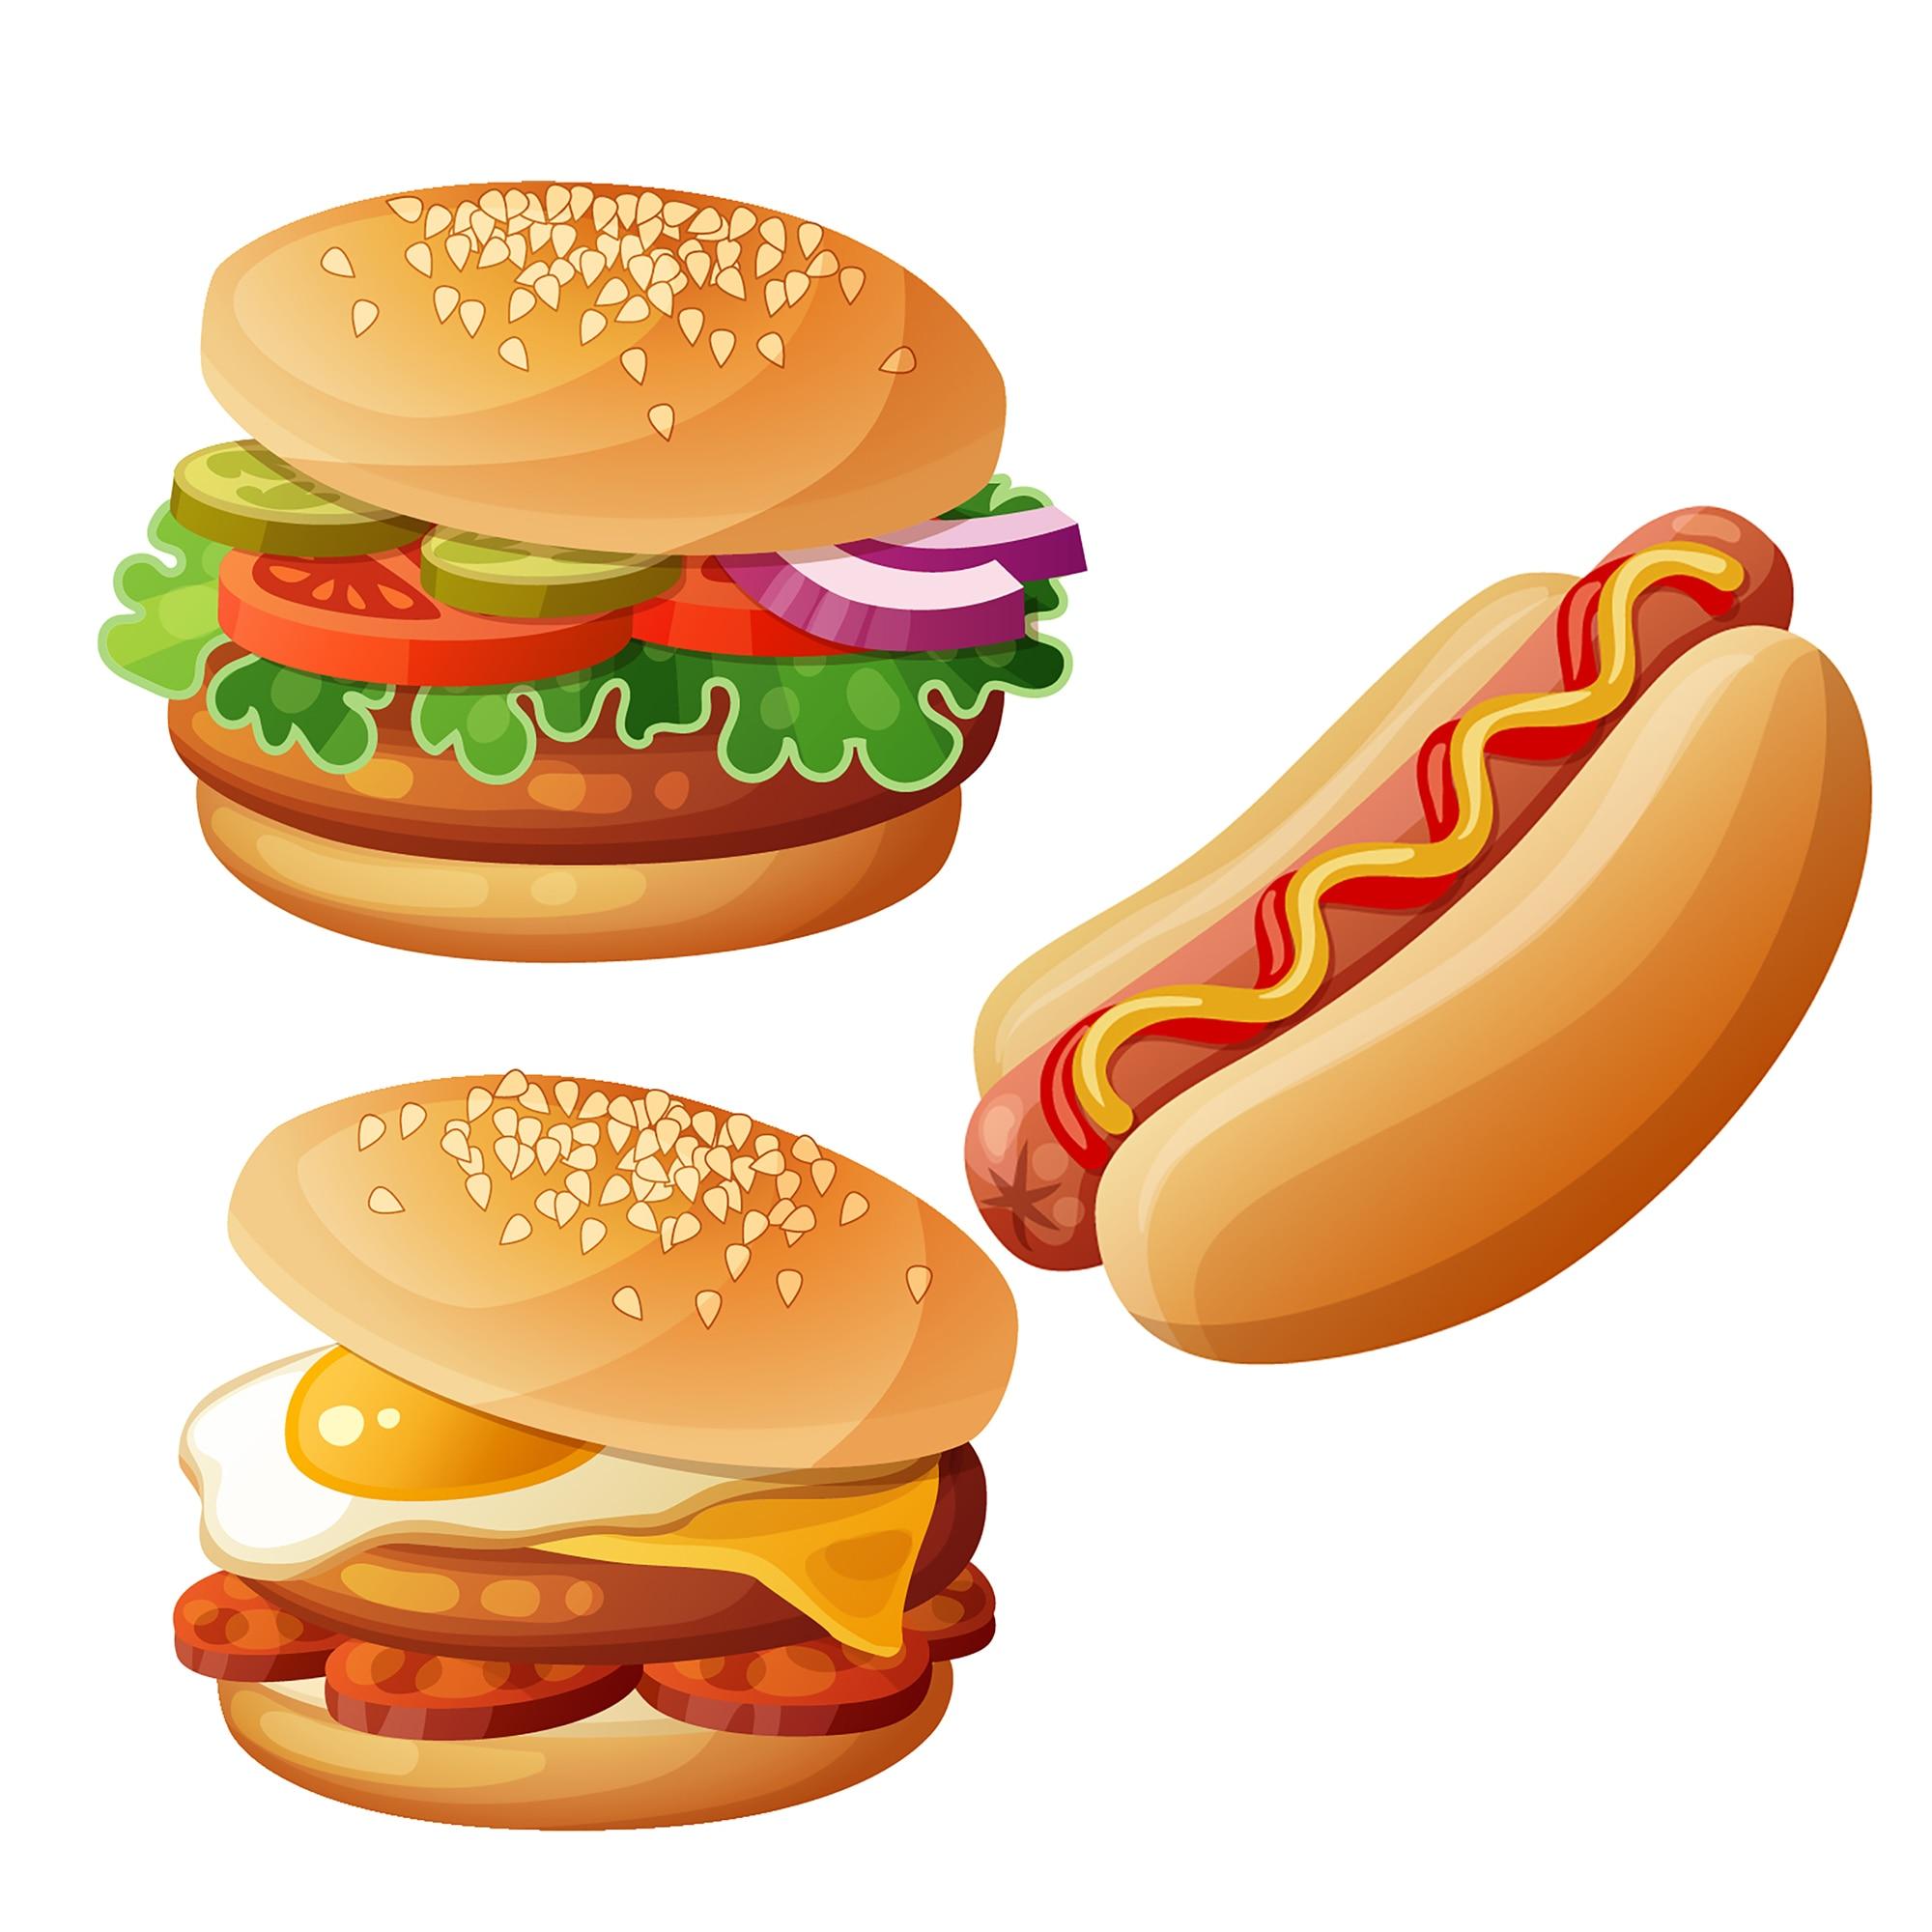 Hamburger Hot dog Praise Sandwich Cake Metal Cutting Dies Delicious Food Stencil for DIY Scrapbooking Card Decorative